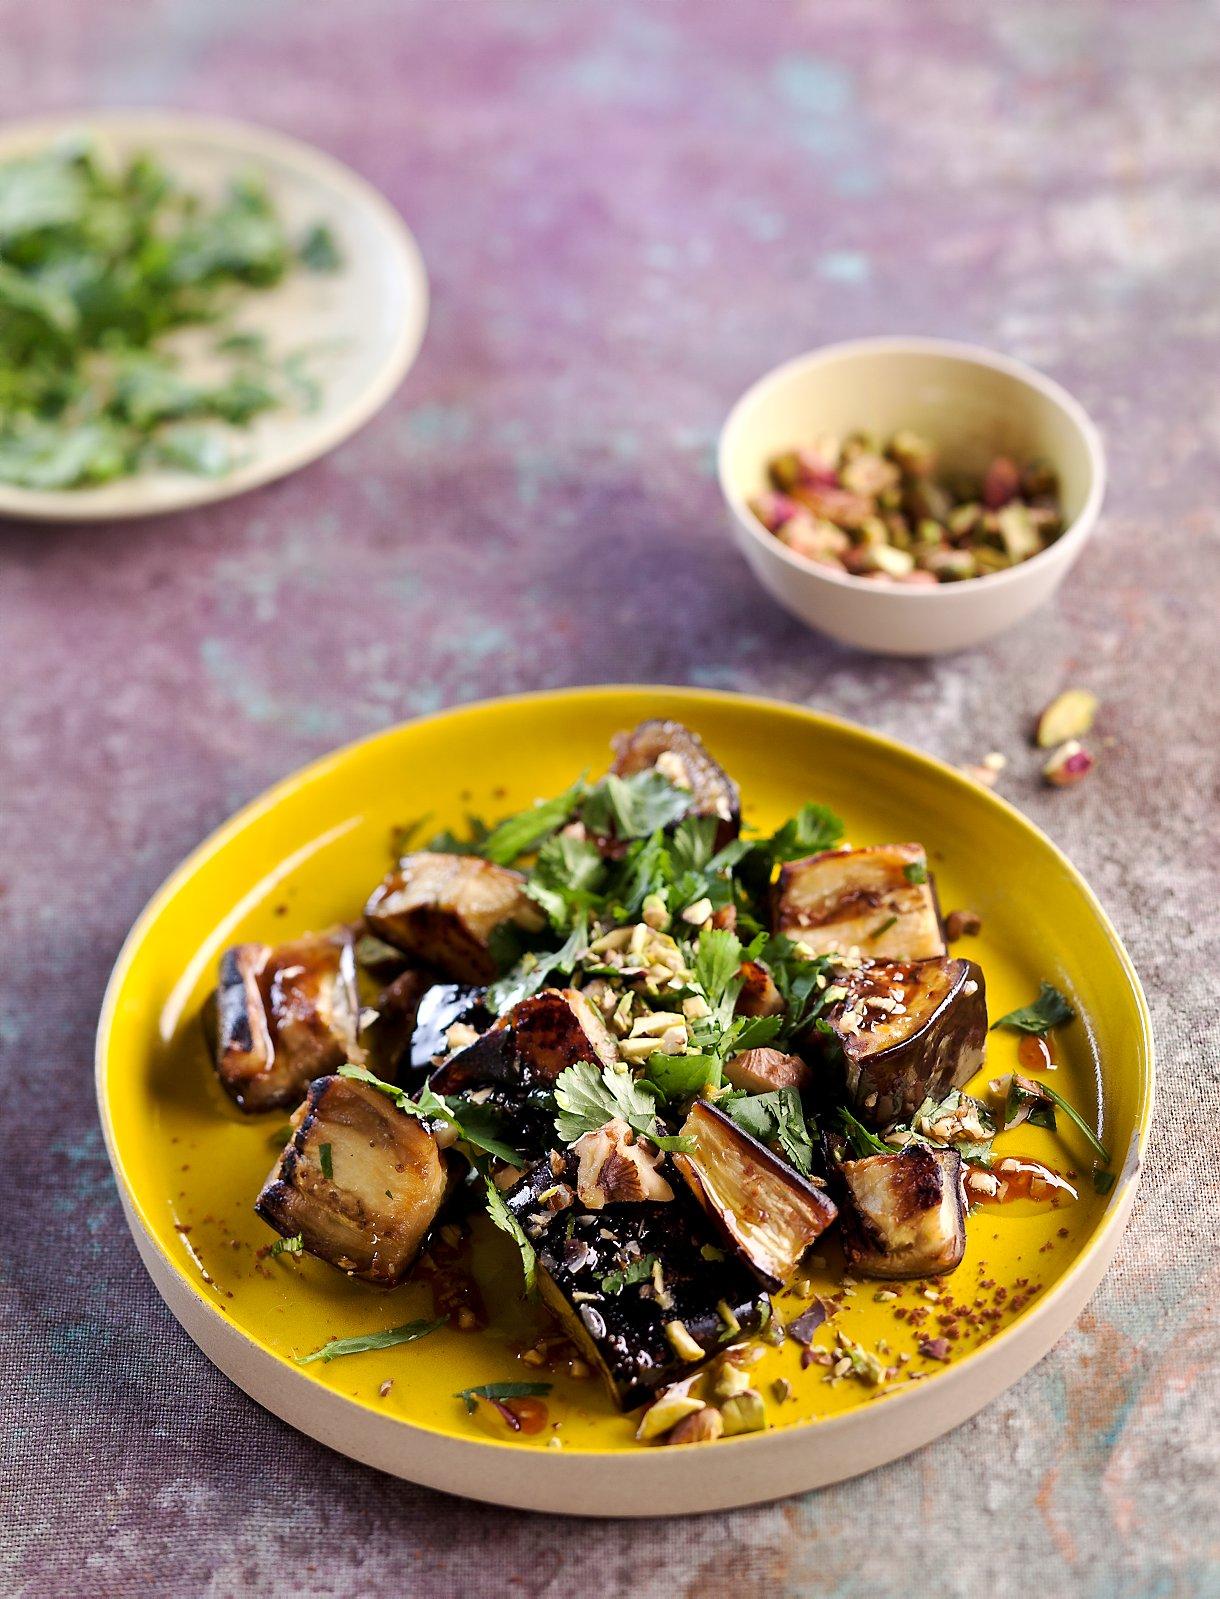 Salade d'aubergines Image